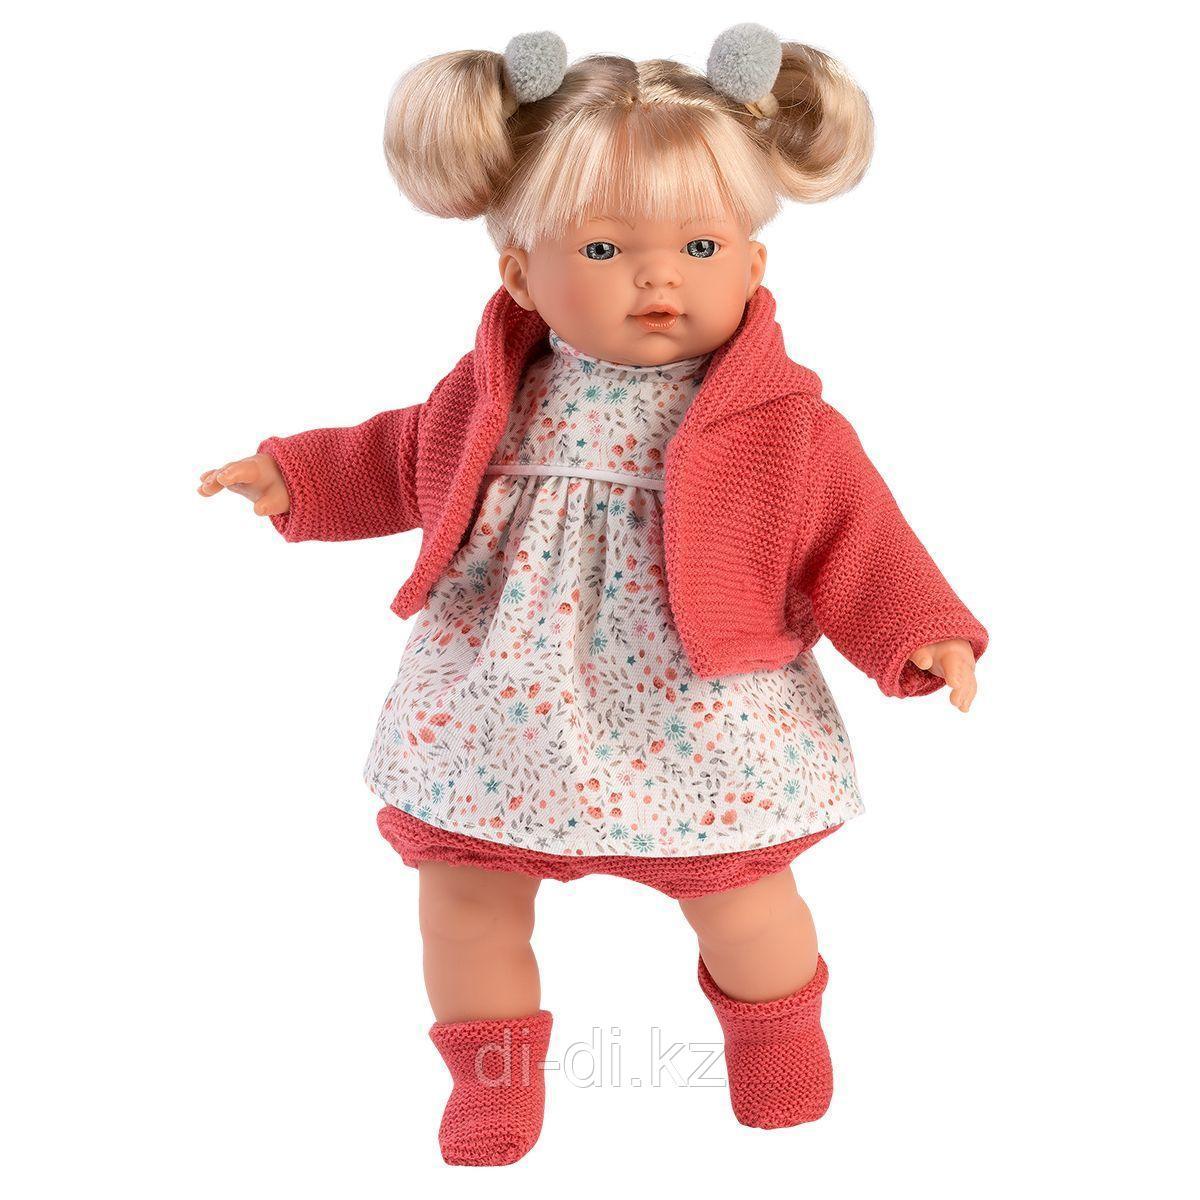 LLORENS Кукла Аитана 33 см, блондинка в красном жакете